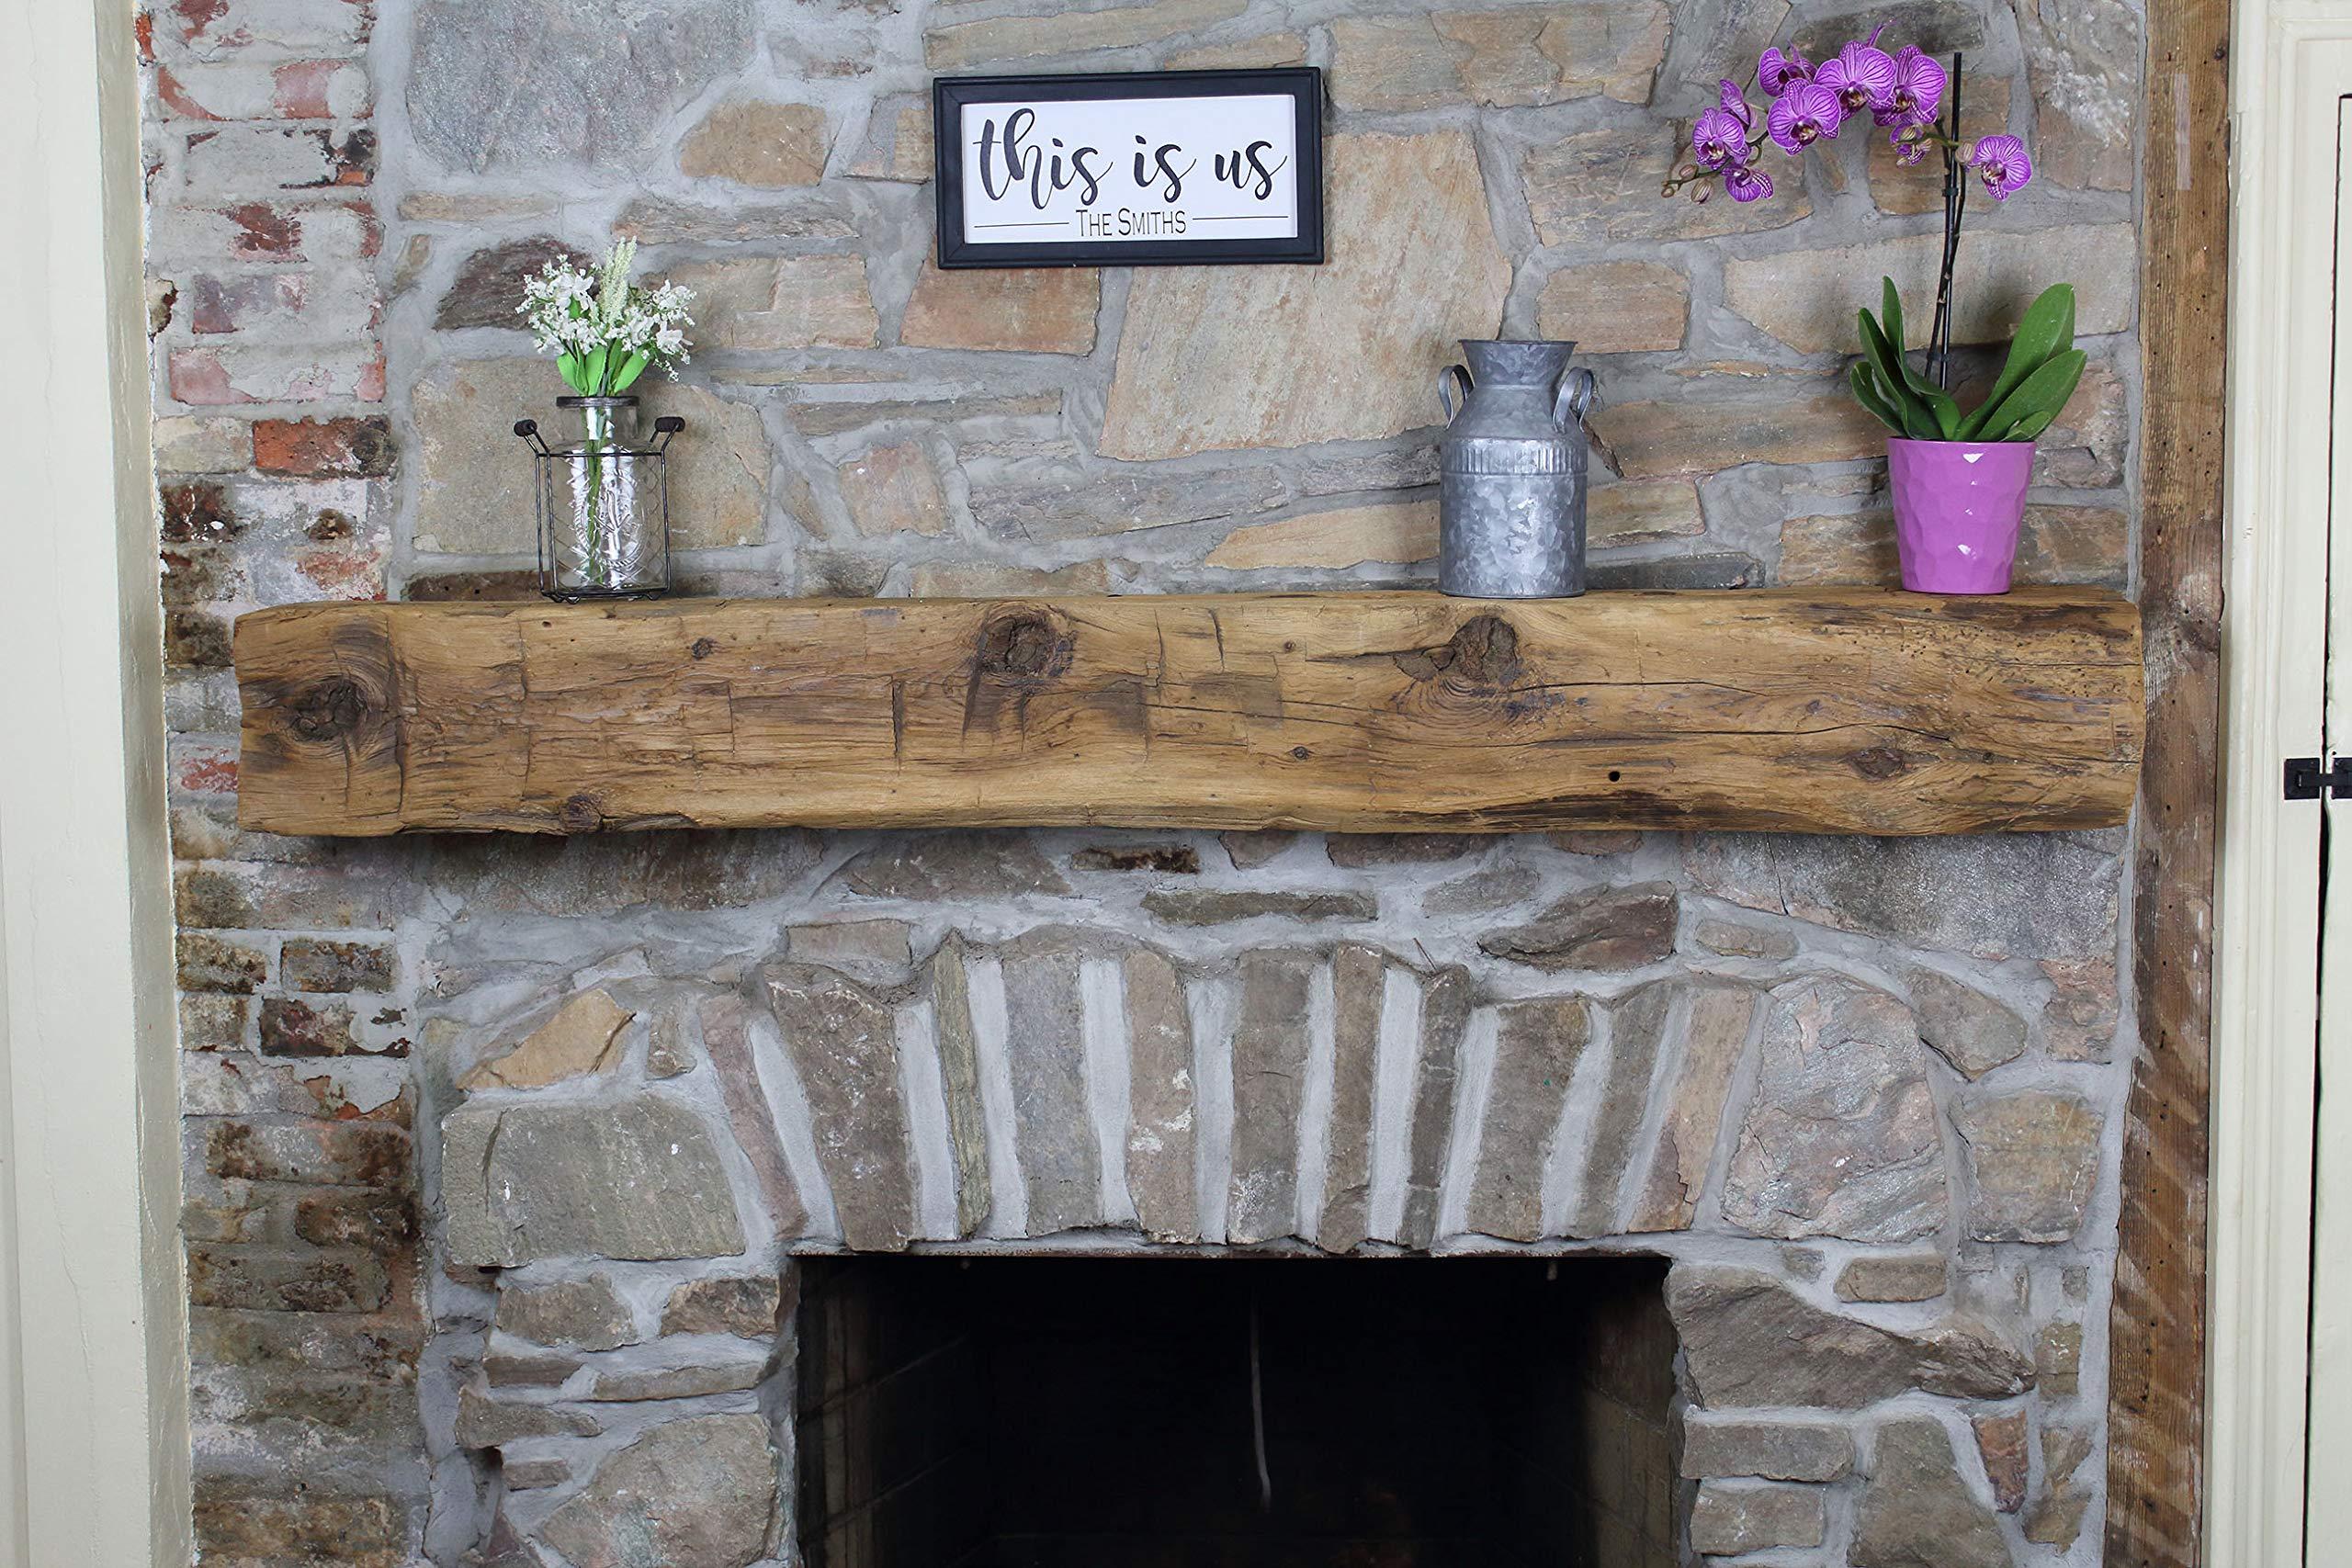 Modern Timber Craft Fireplace Mantel Shelf - Hand Hewn Wood Barn Beam - Authentic Reclaimed Wooden Rustic Shelving 60 Inches by Modern Timber Craft